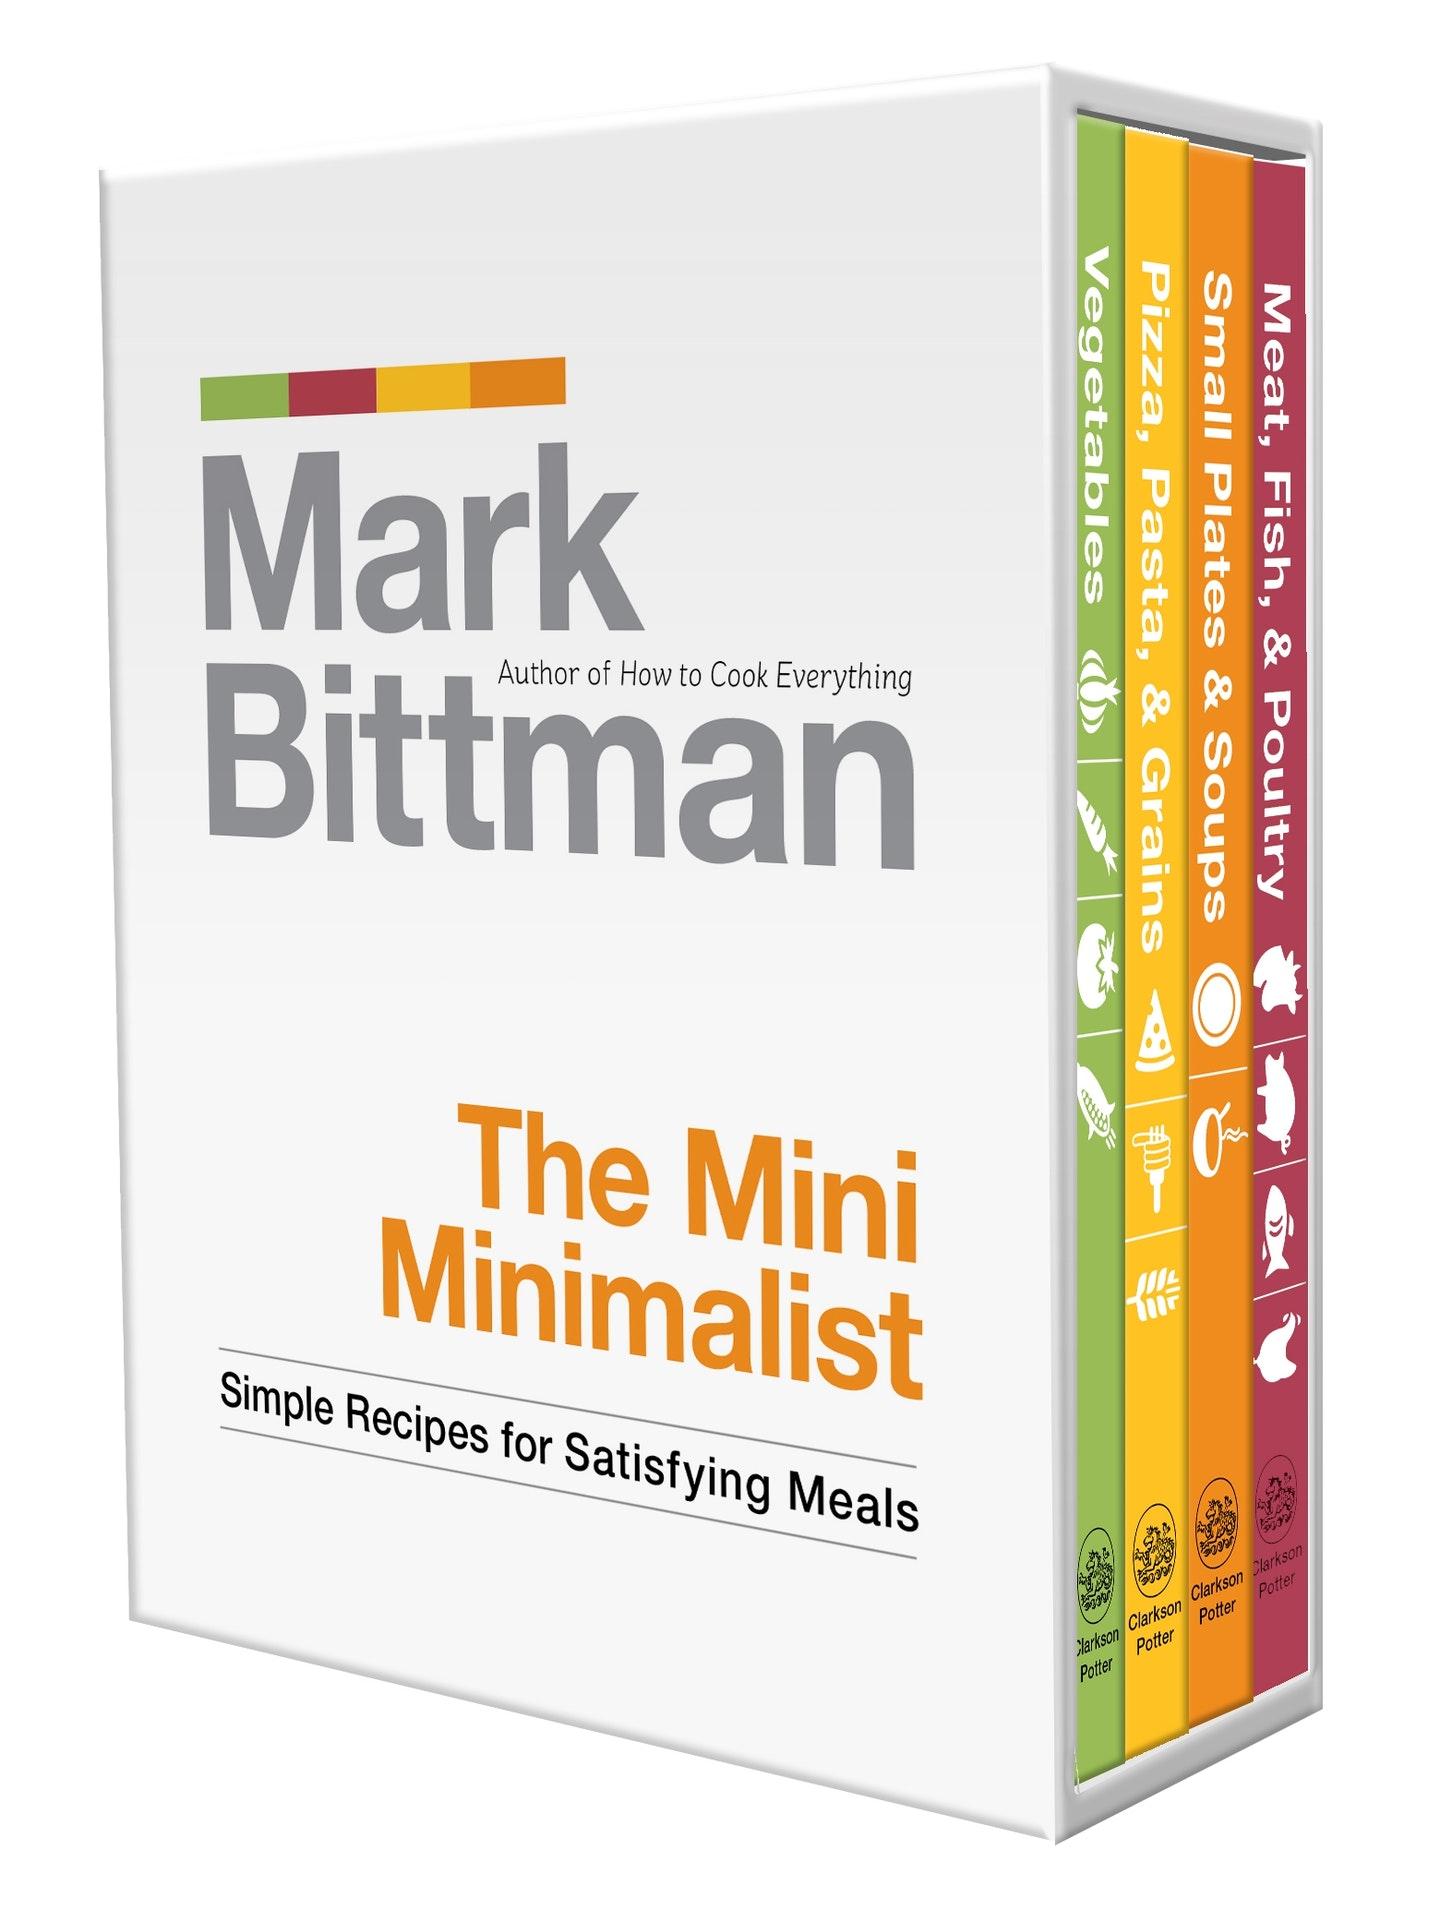 Minimalist Book Cover Uk : The mini minimalist penguin books australia